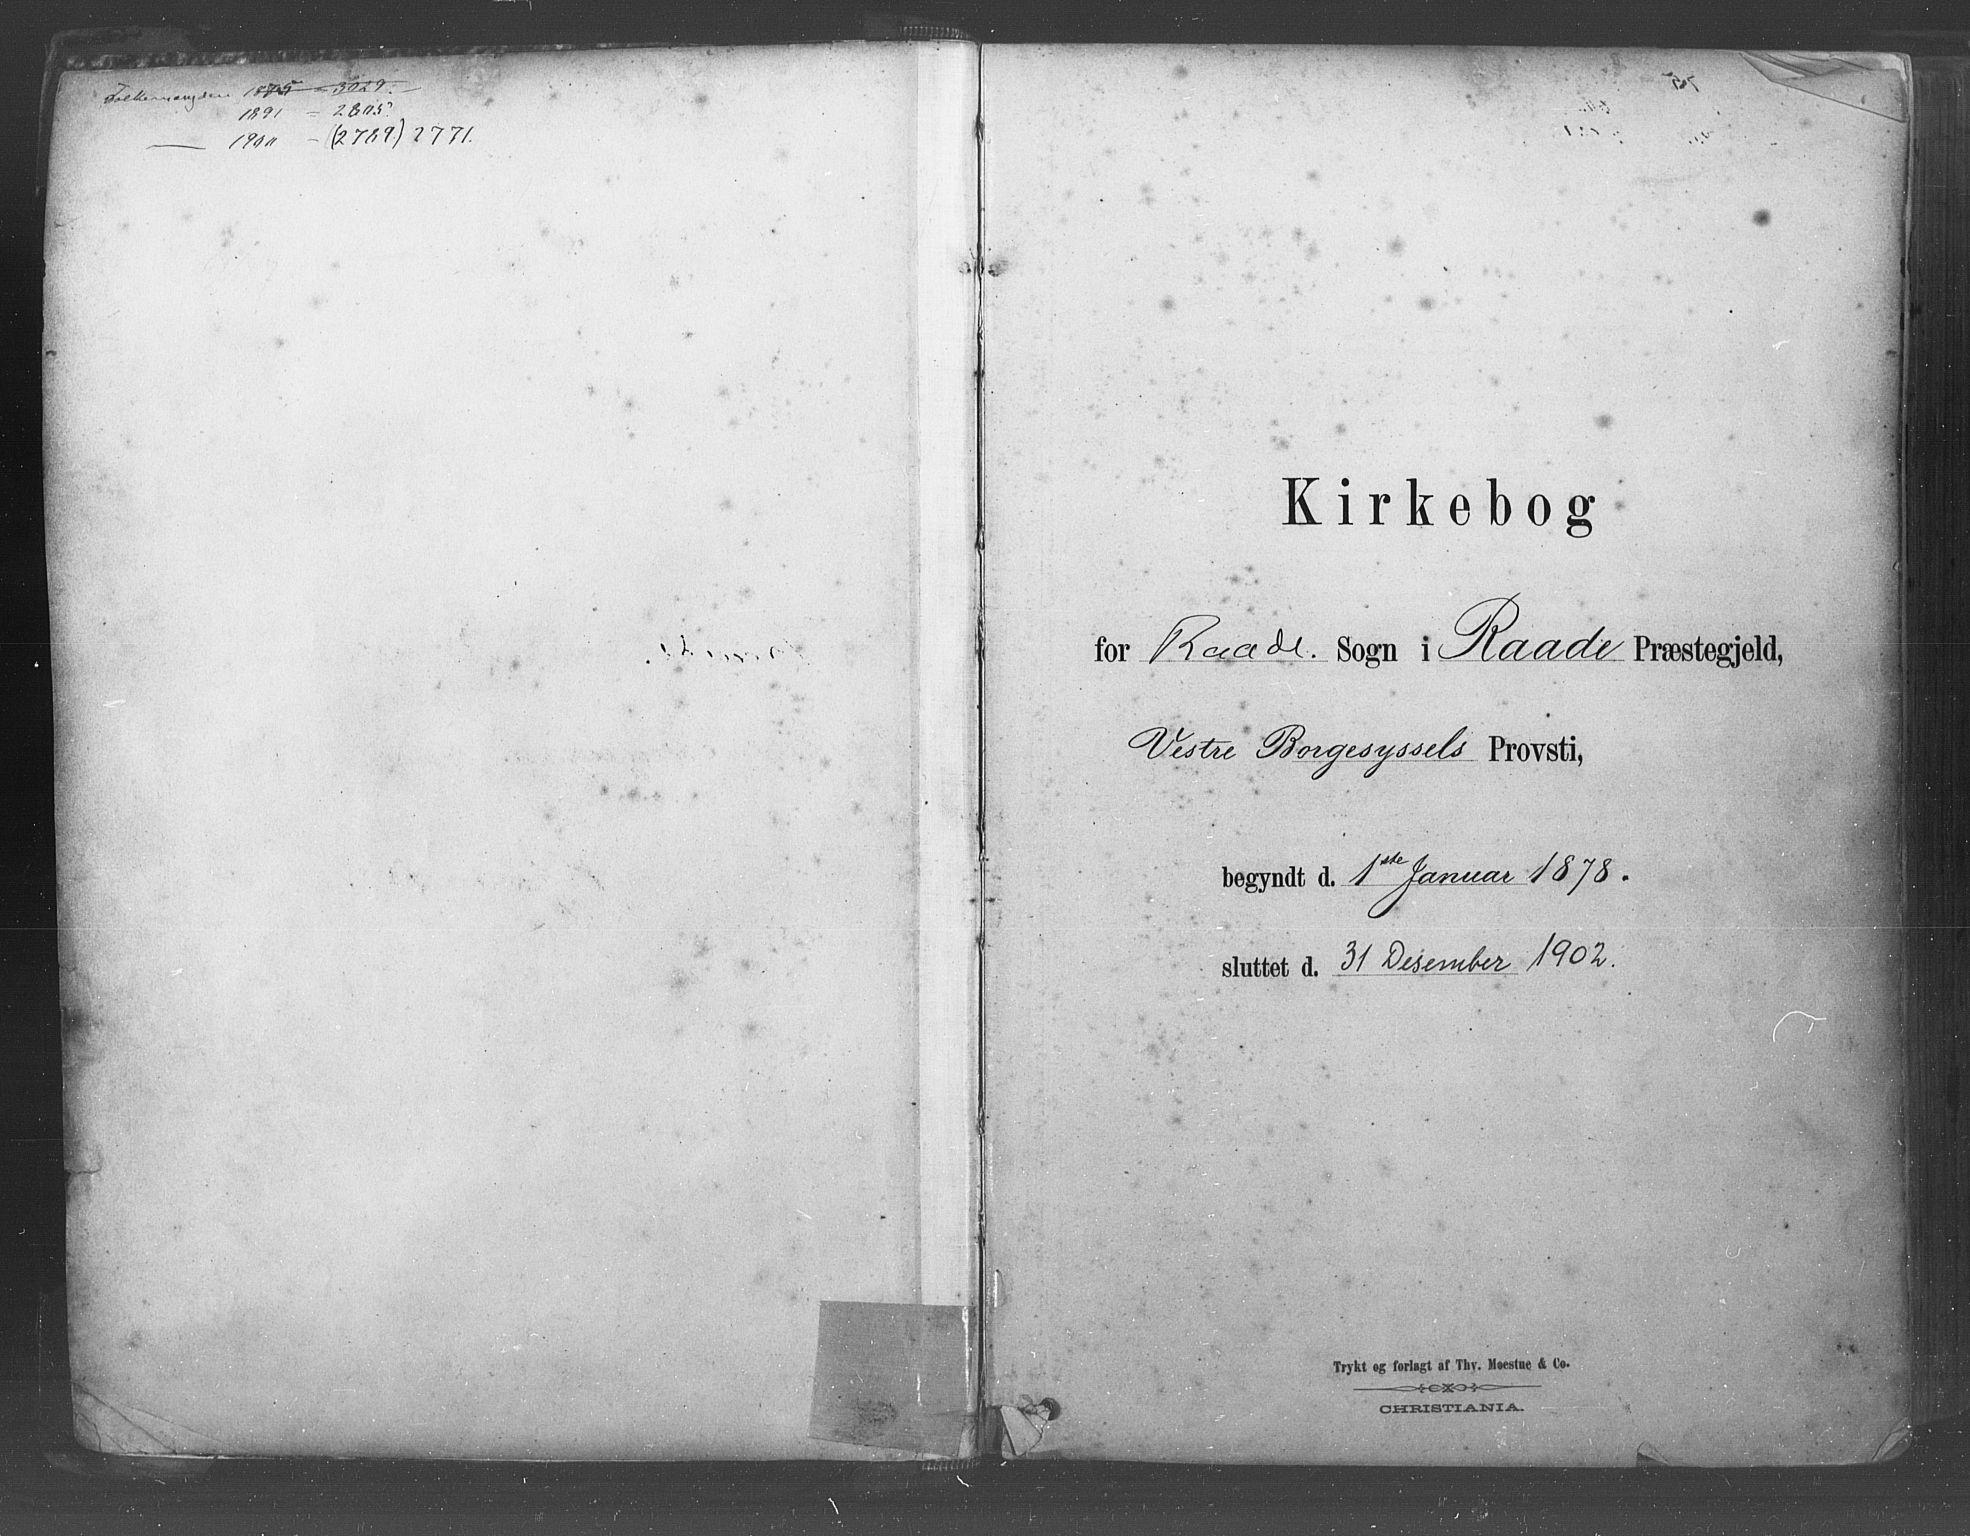 SAO, Råde prestekontor kirkebøker, F/Fa/L0007: Ministerialbok nr. 7, 1878-1902